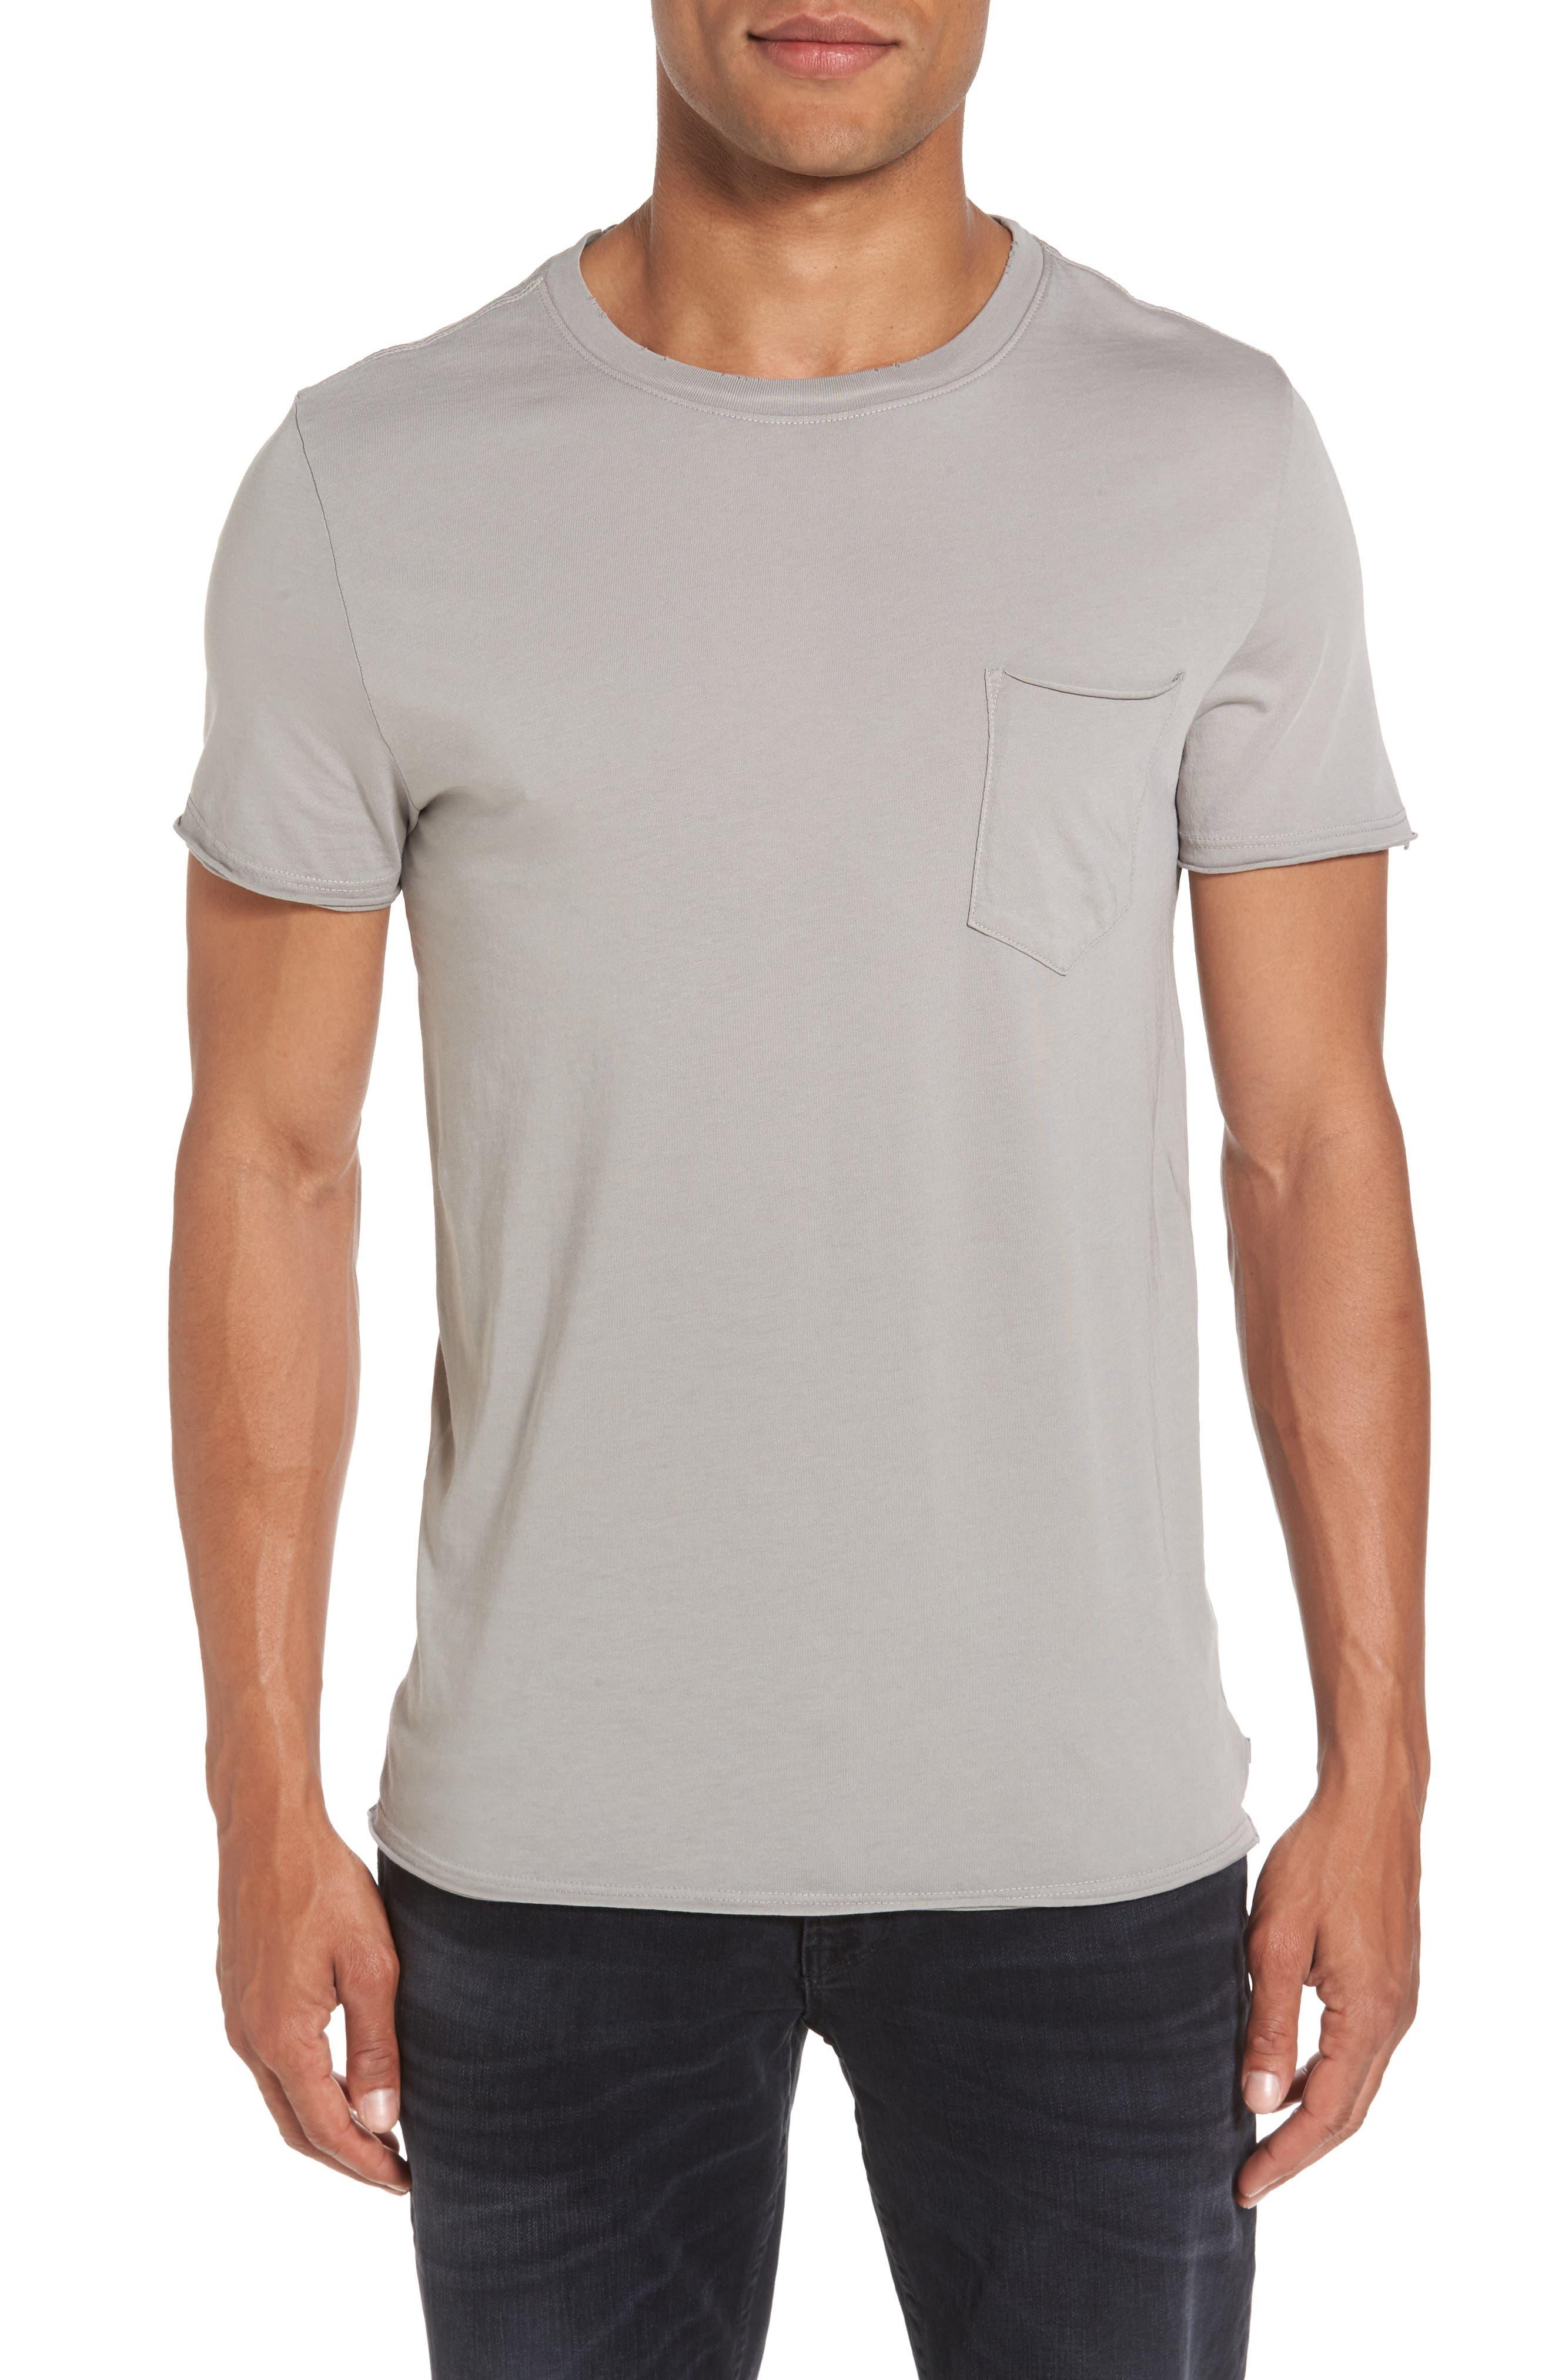 Anders Slim Fit Pocket T-Shirt,                             Main thumbnail 1, color,                             Sun Faded Grey Haze